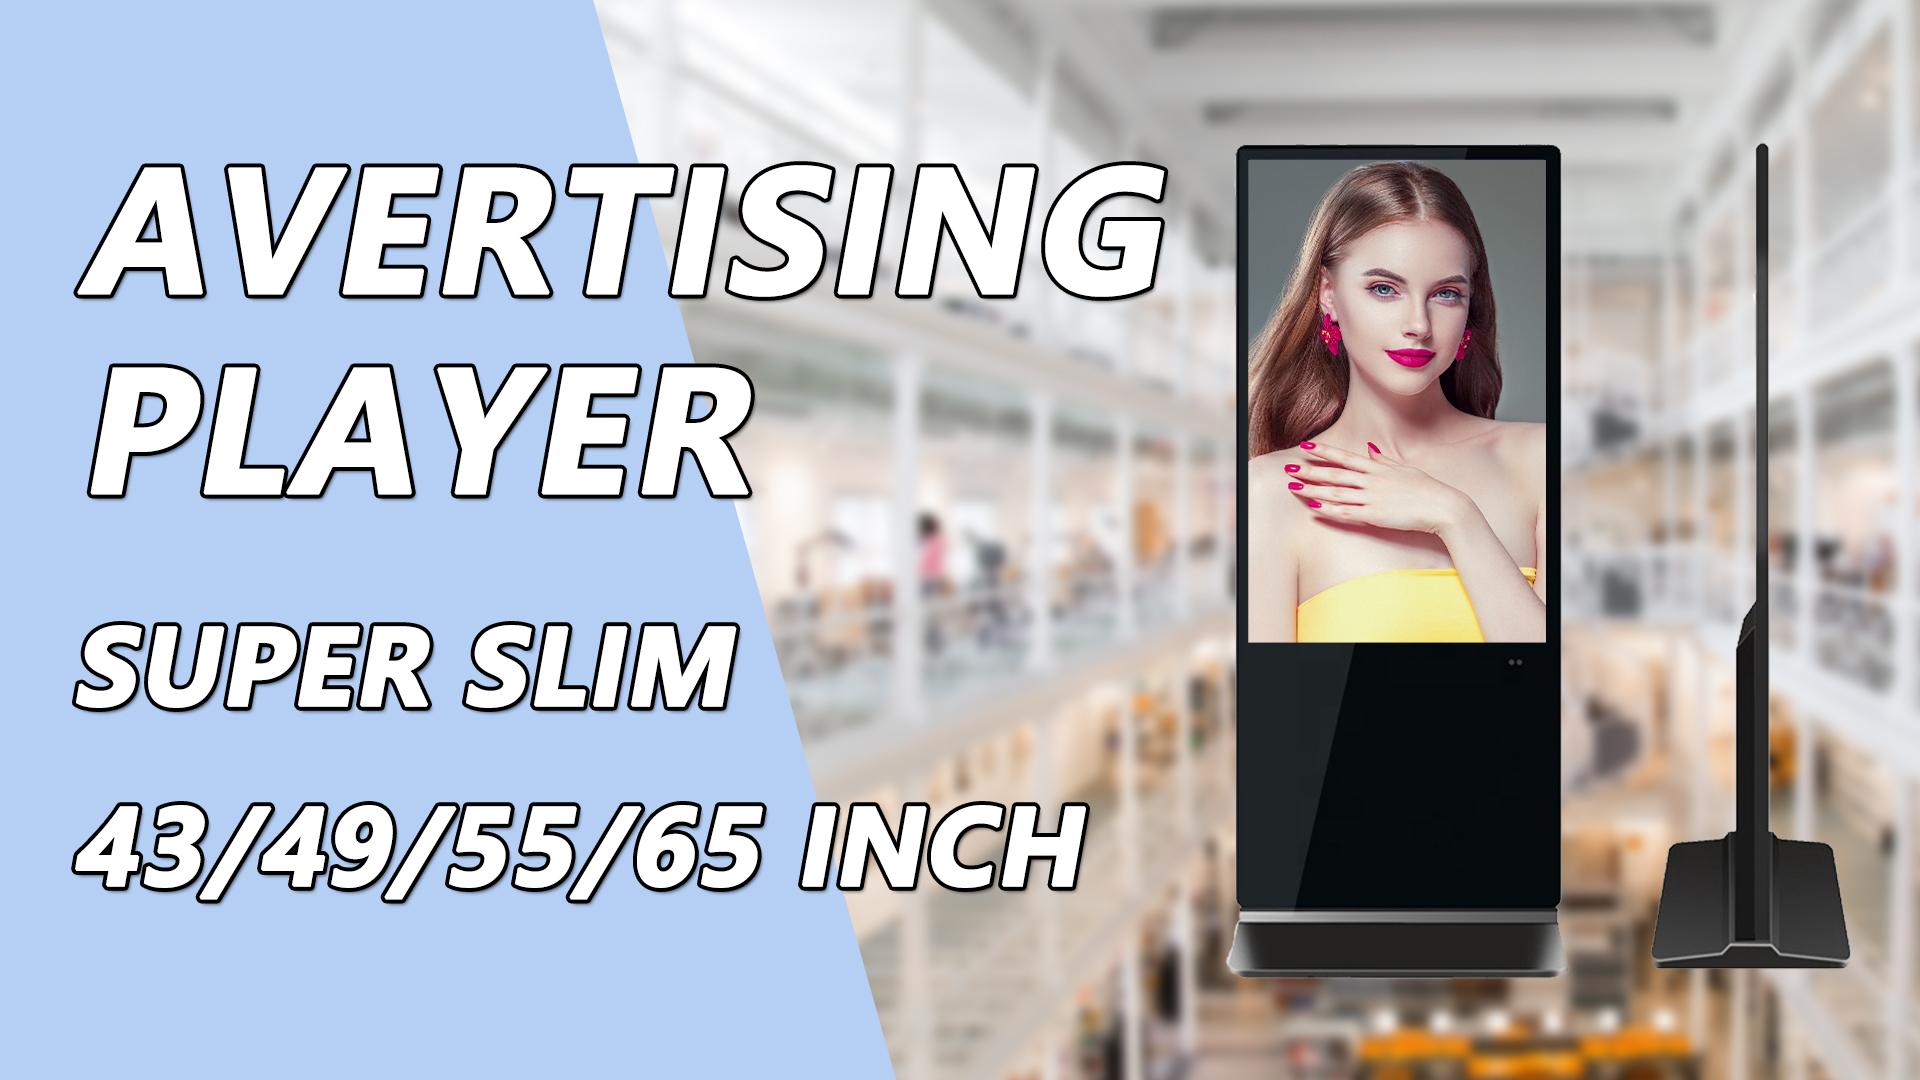 standalone wifi 3g 42 inch standing standindoor floor stand indoor lcd digital signage advertising display